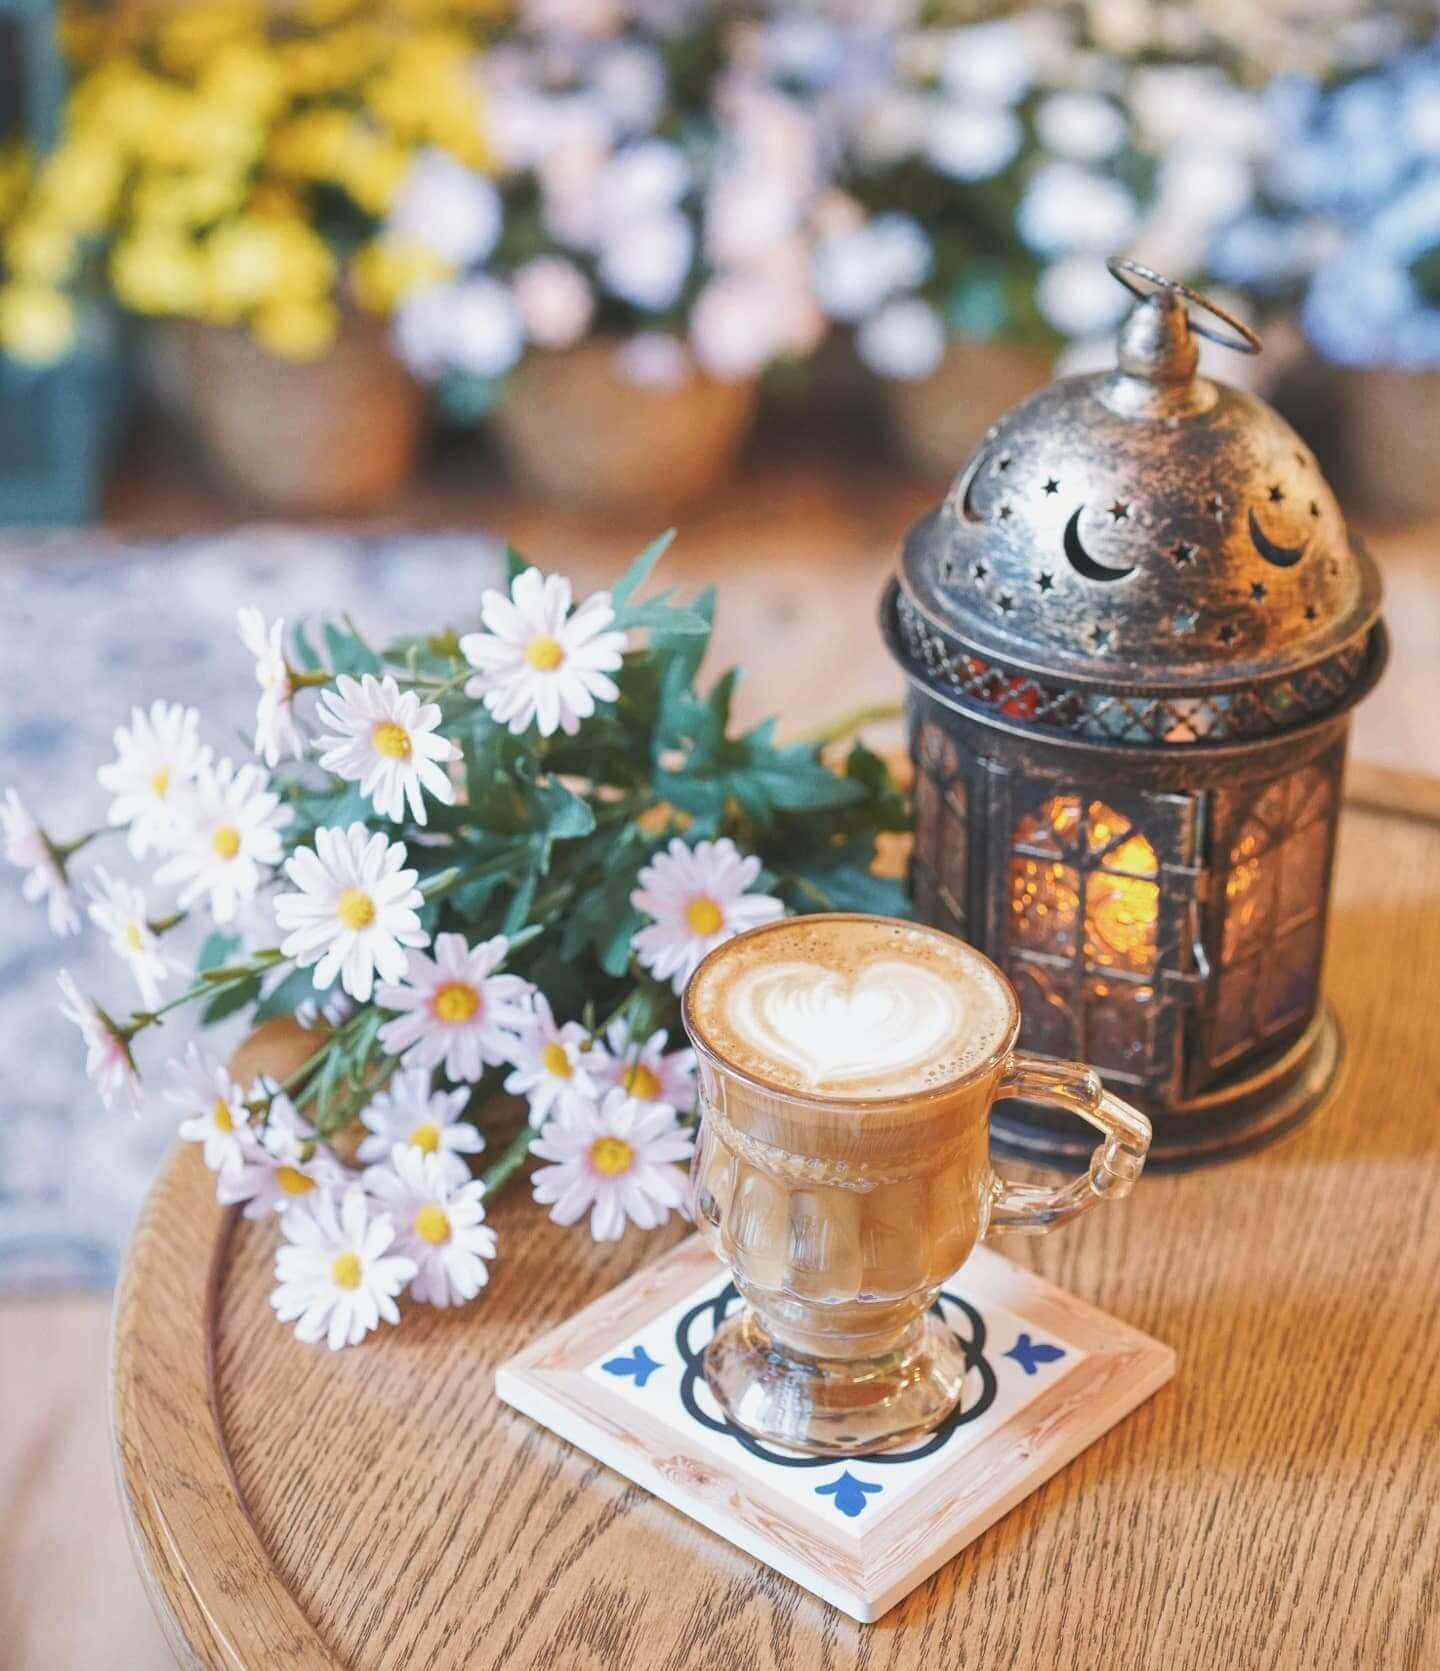 Piccolo選用House Blend咖啡豆,口感厚滑。